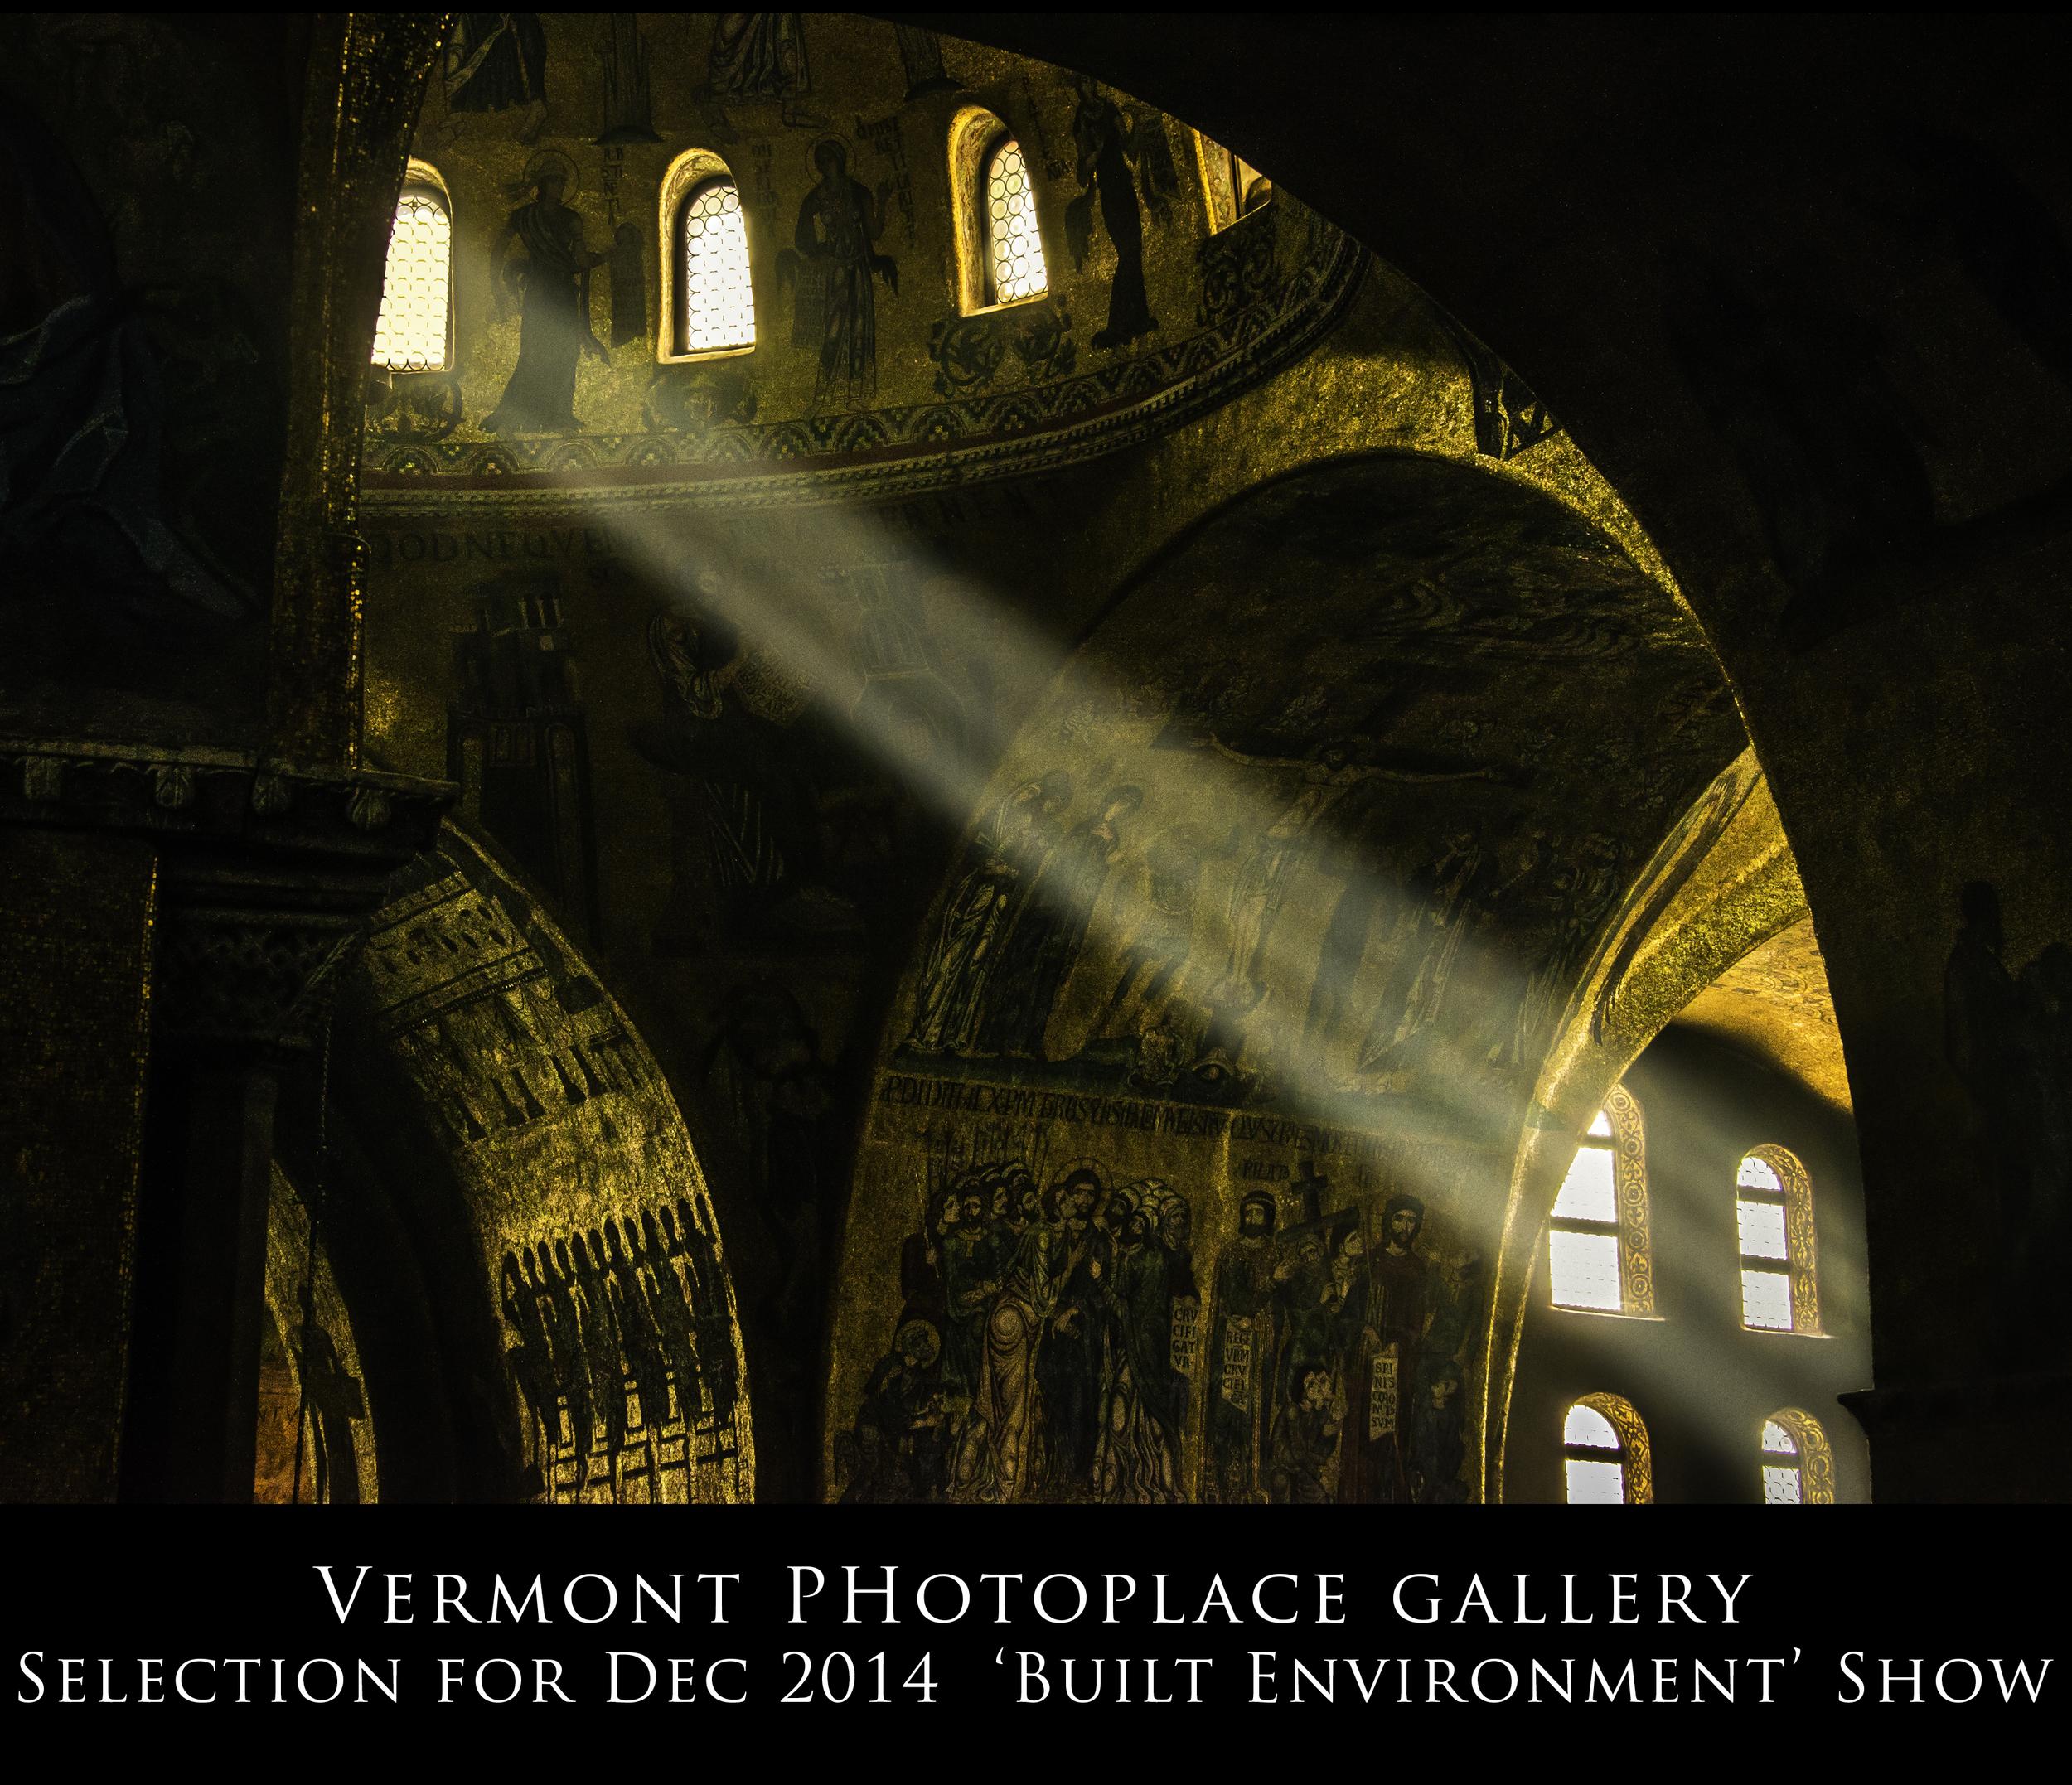 2014-IlluminationOfSanMarco_122014VTPPGallery.jpg